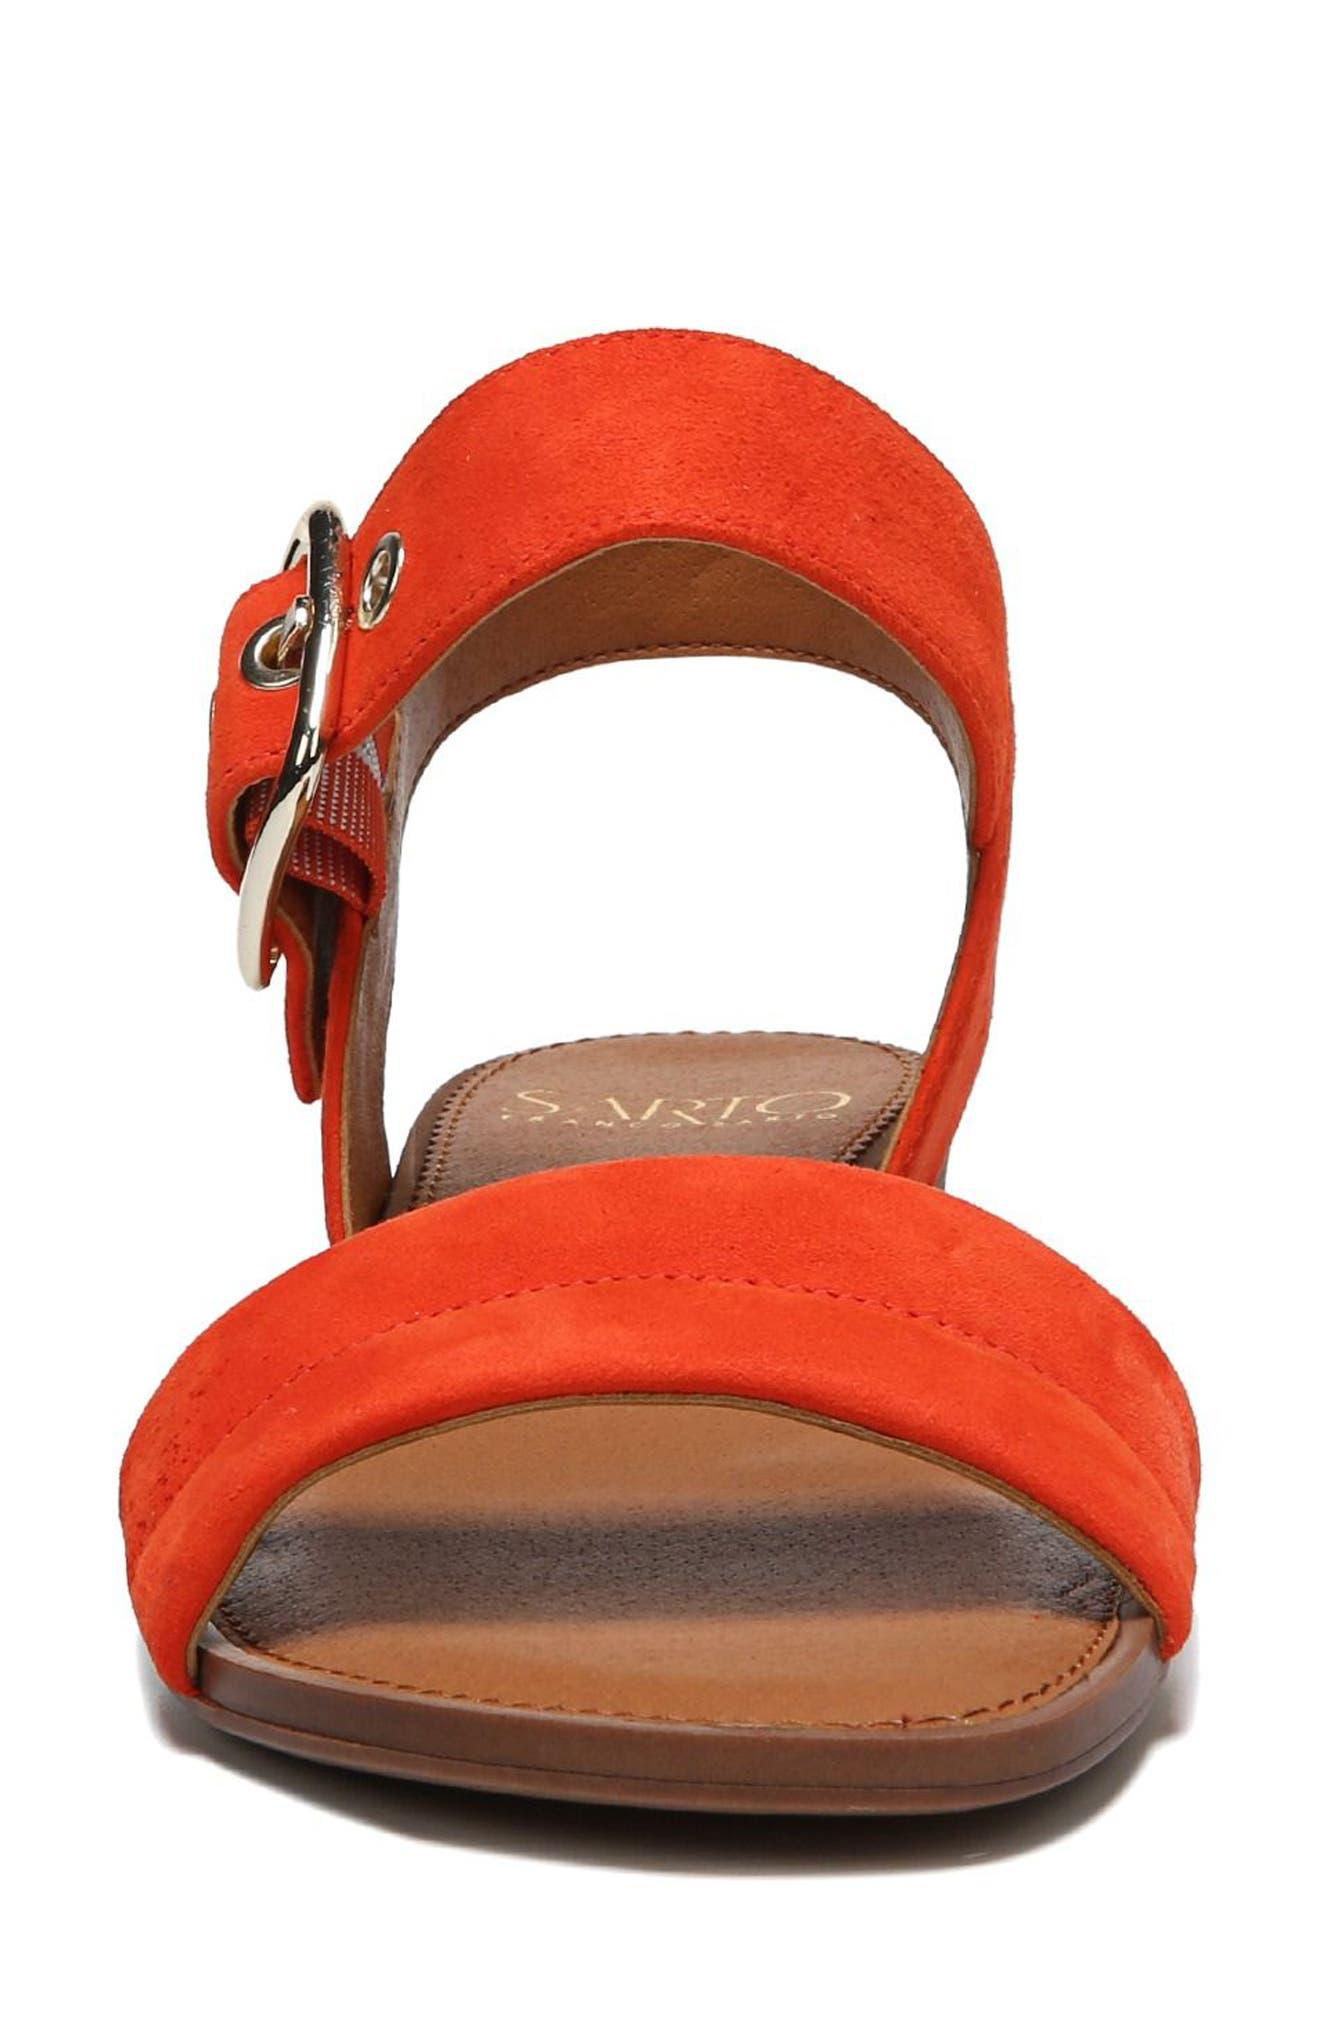 Patterson Low Wedge Sandal,                             Alternate thumbnail 28, color,